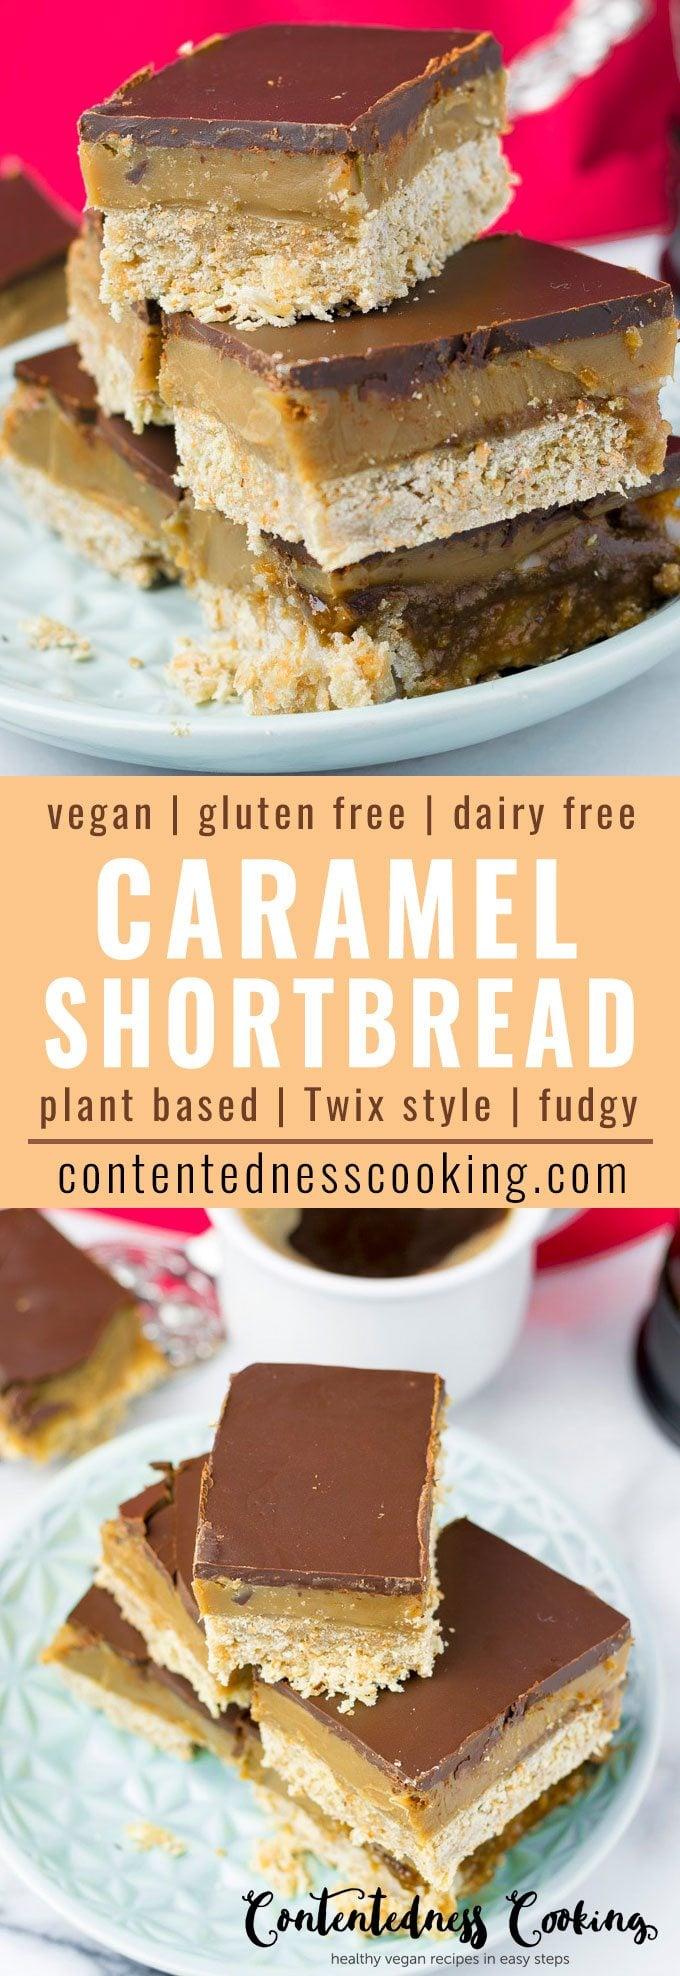 Vegan Caramel Shortbread Copycat Twix Style | #vegan #glutenfree #plantbased #dairyfree #contentednesscooking